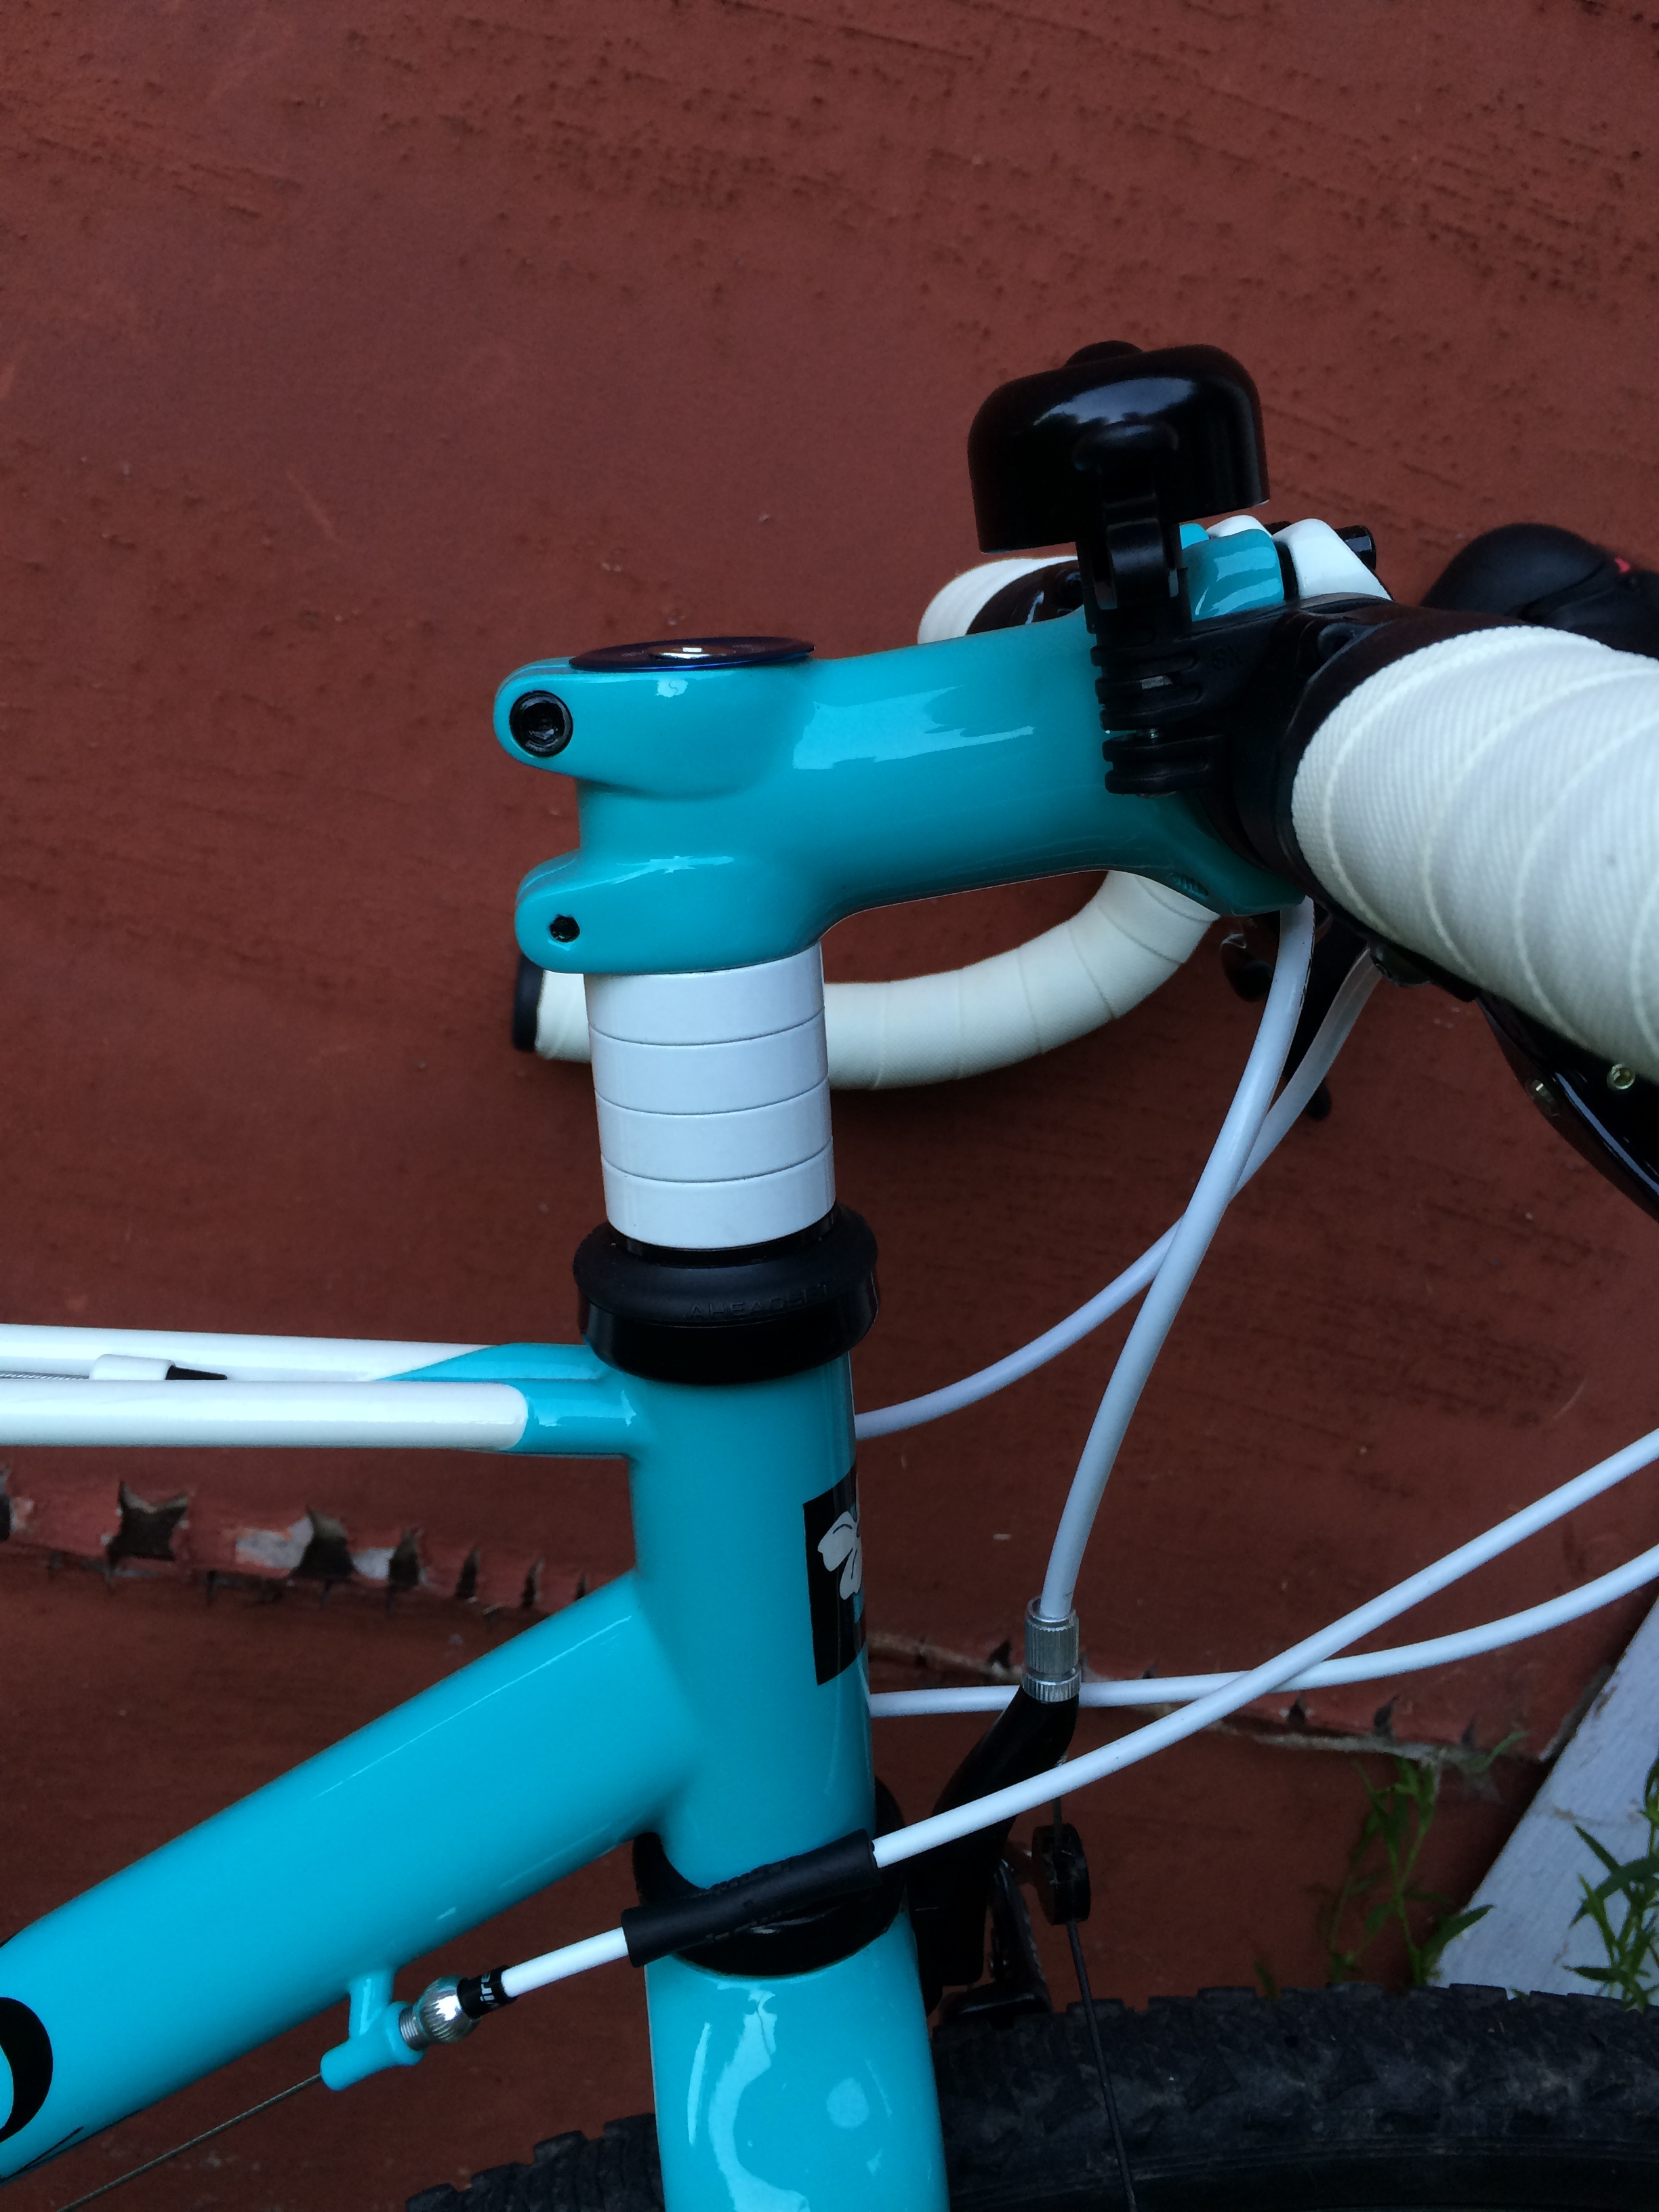 Dogwood-cycleworx-steel-custom-bicycle-columbus-tubing-cyclo-cross-17.jpg